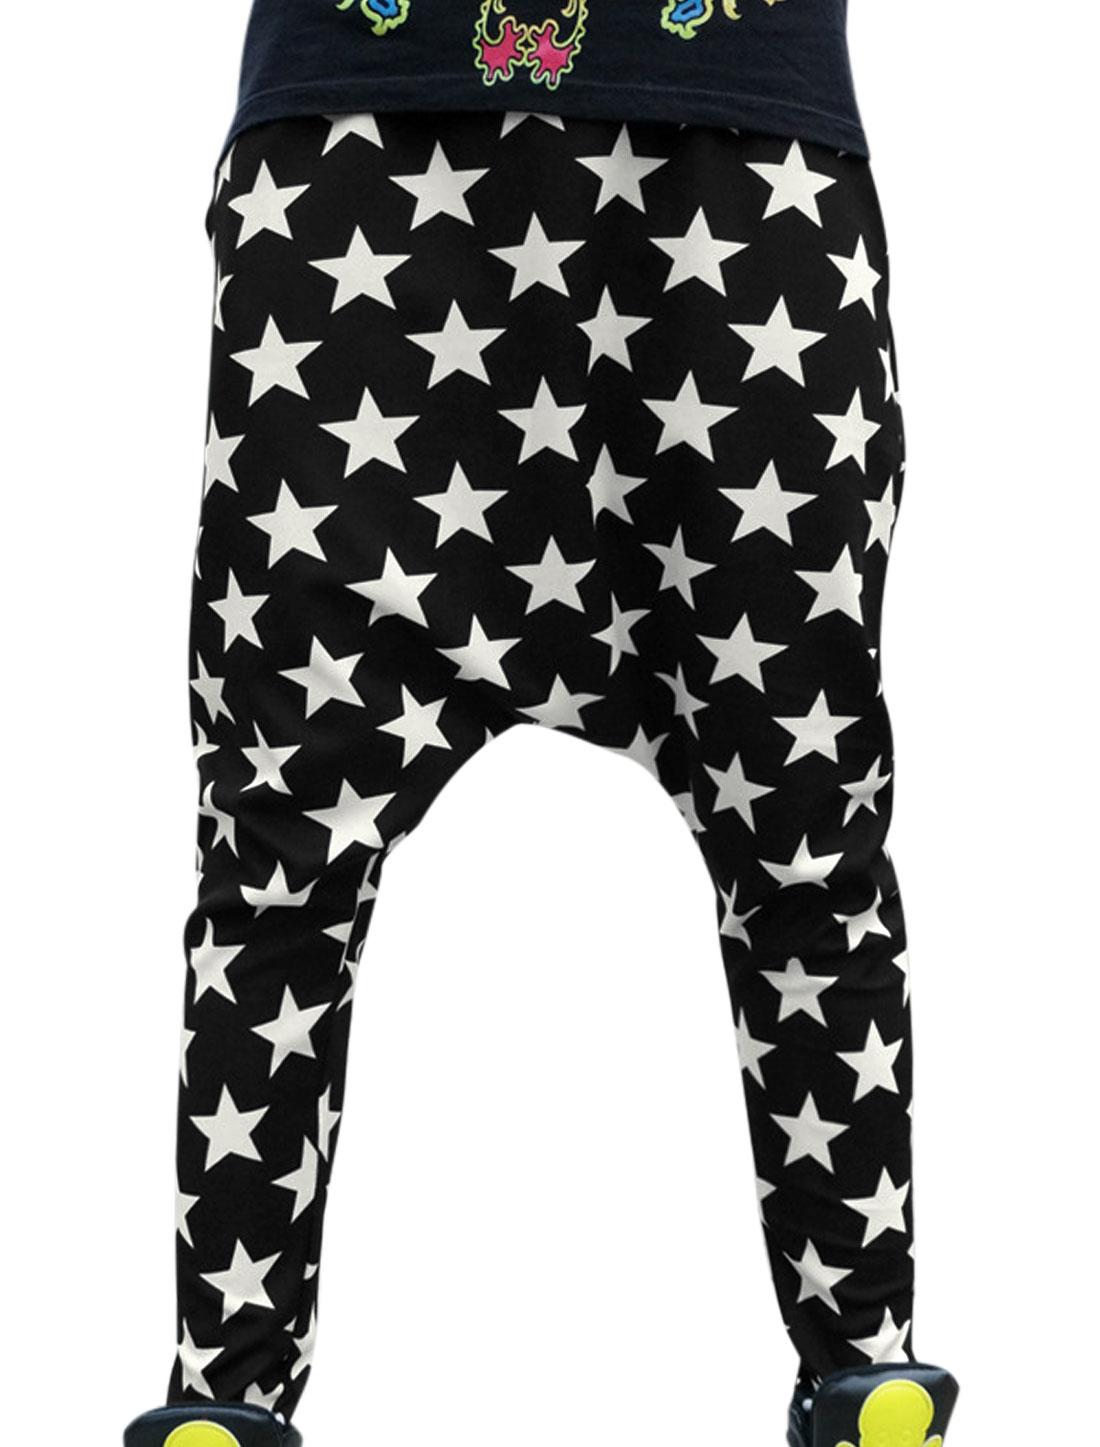 Women Two Slant Pockets Stars Pattern Fashionable Harem Pants Black S